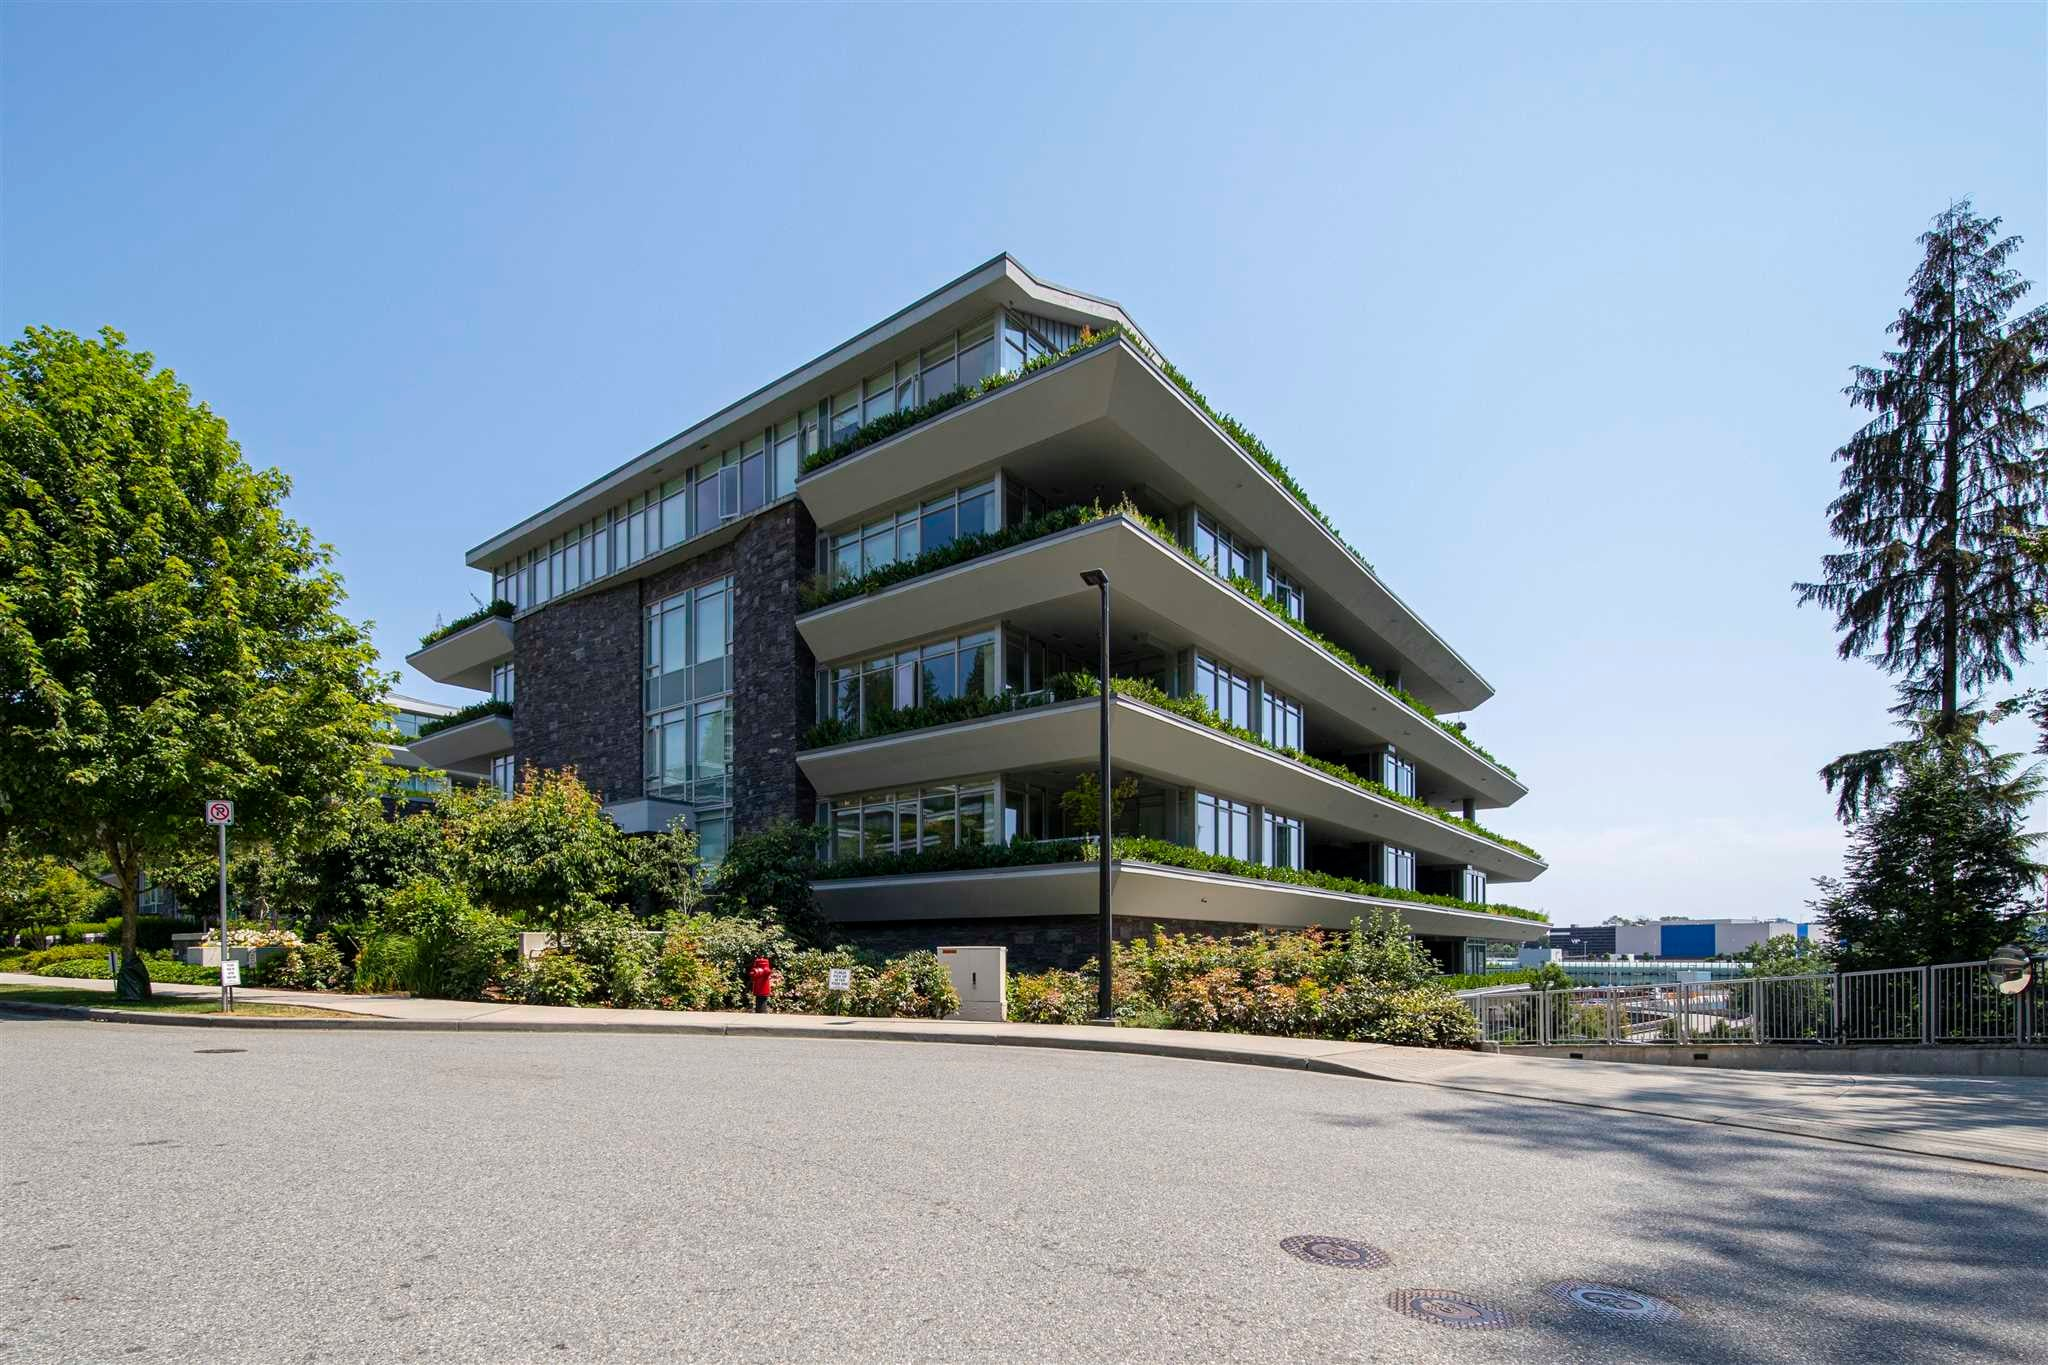 203 866 ARTHUR ERICKSON PLACE - Park Royal Apartment/Condo for sale, 2 Bedrooms (R2547532)